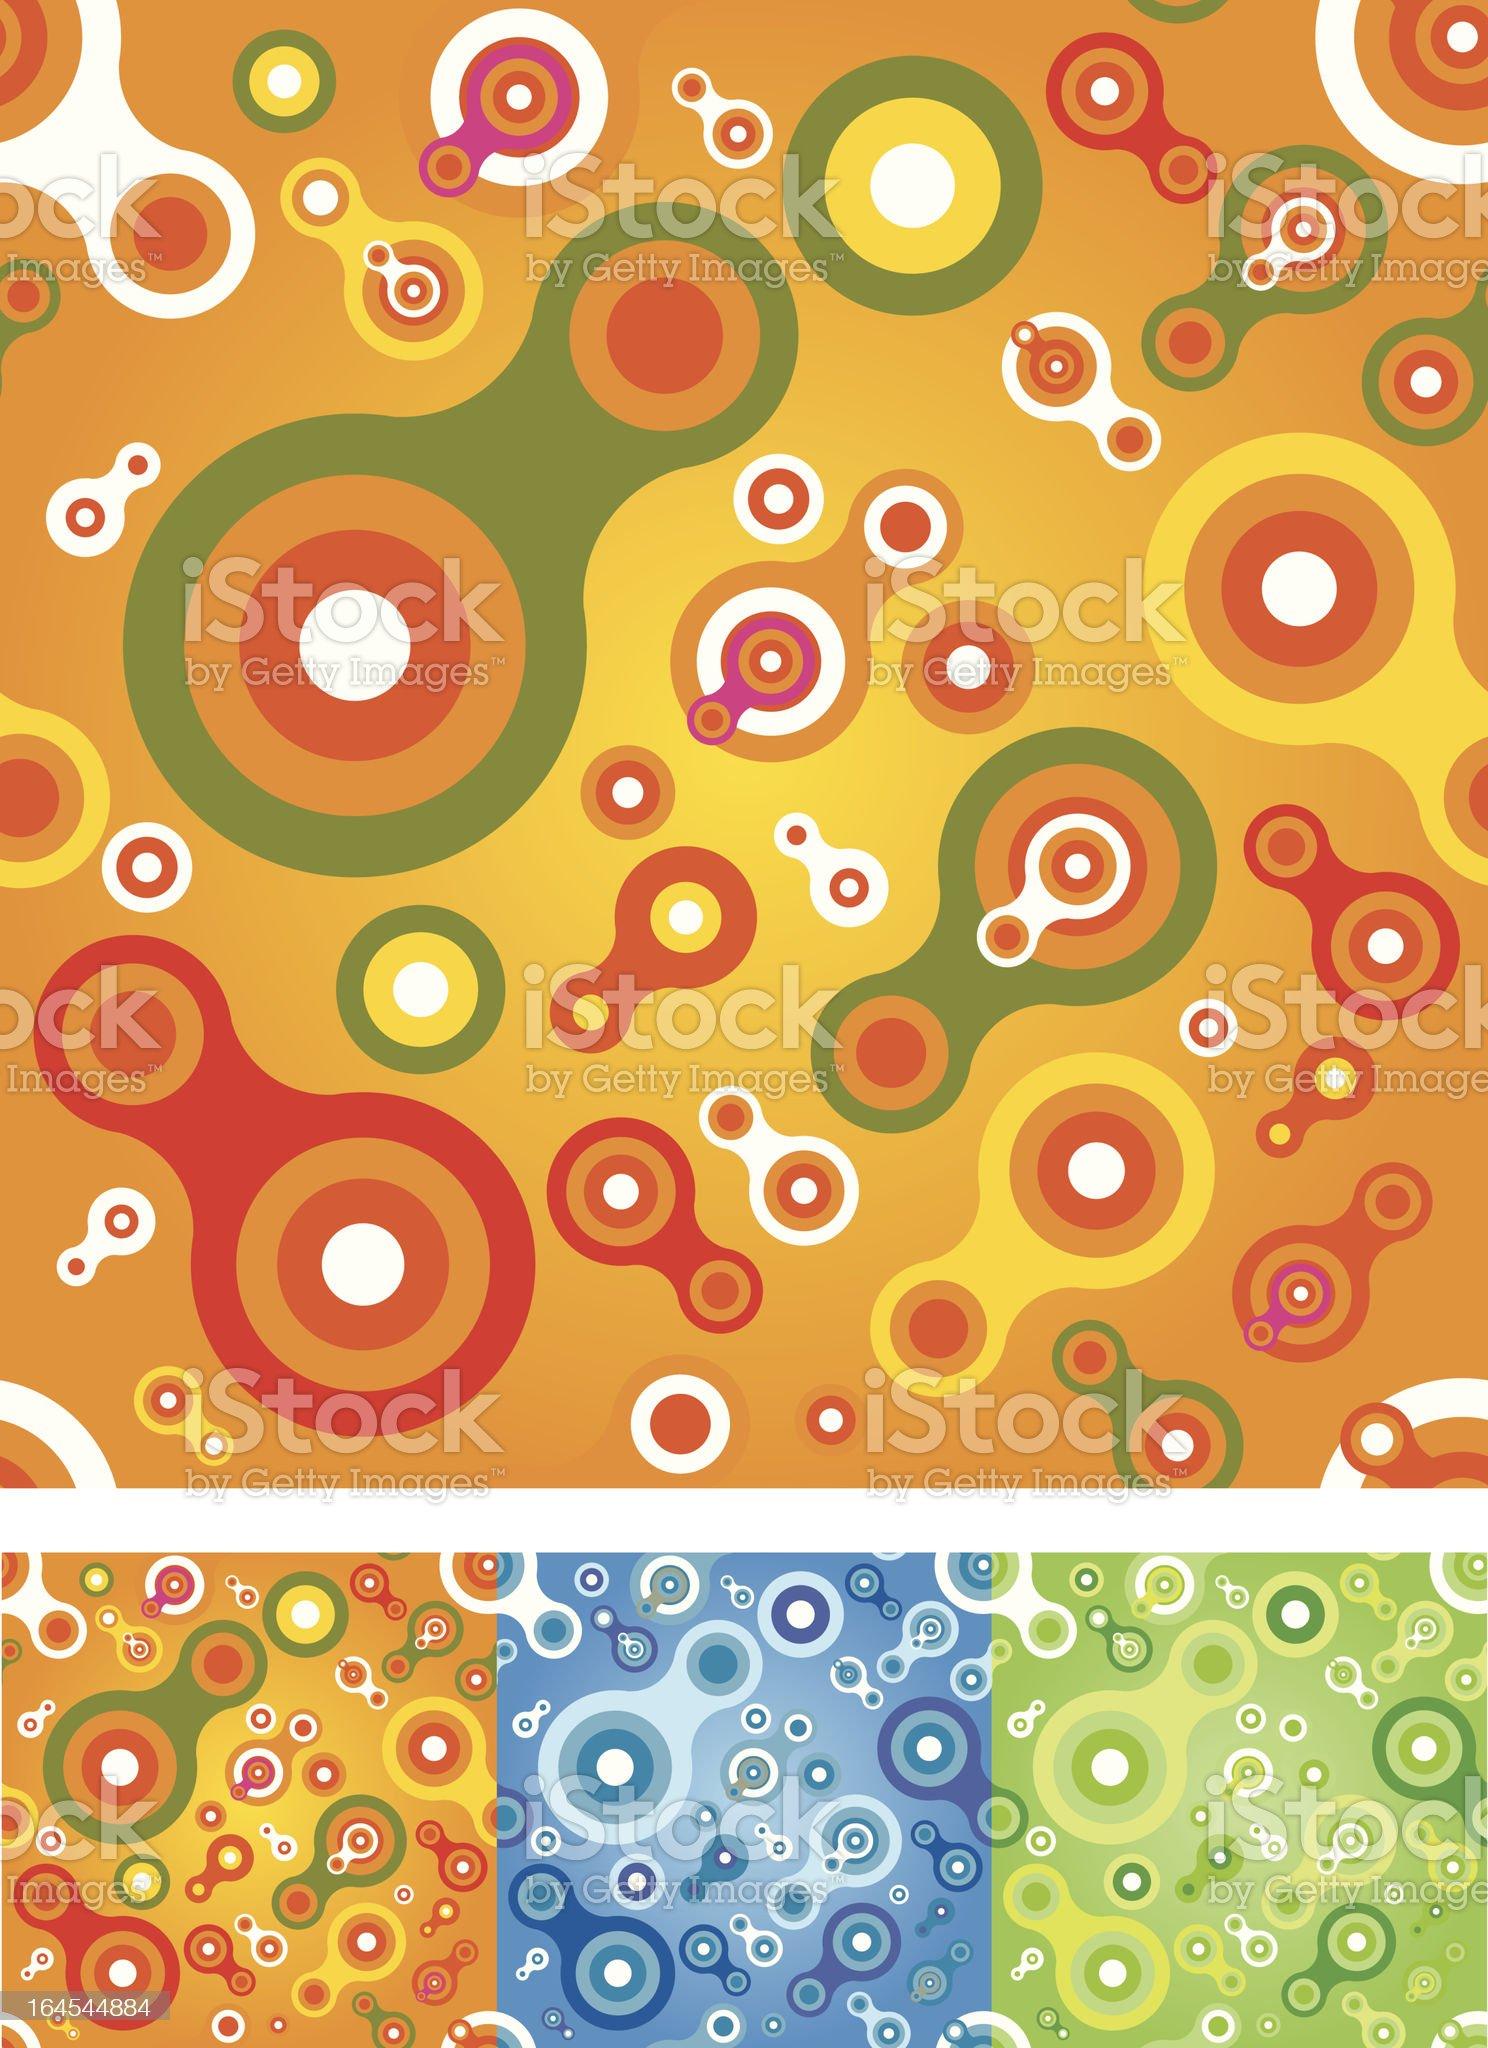 Retro Background royalty-free stock vector art